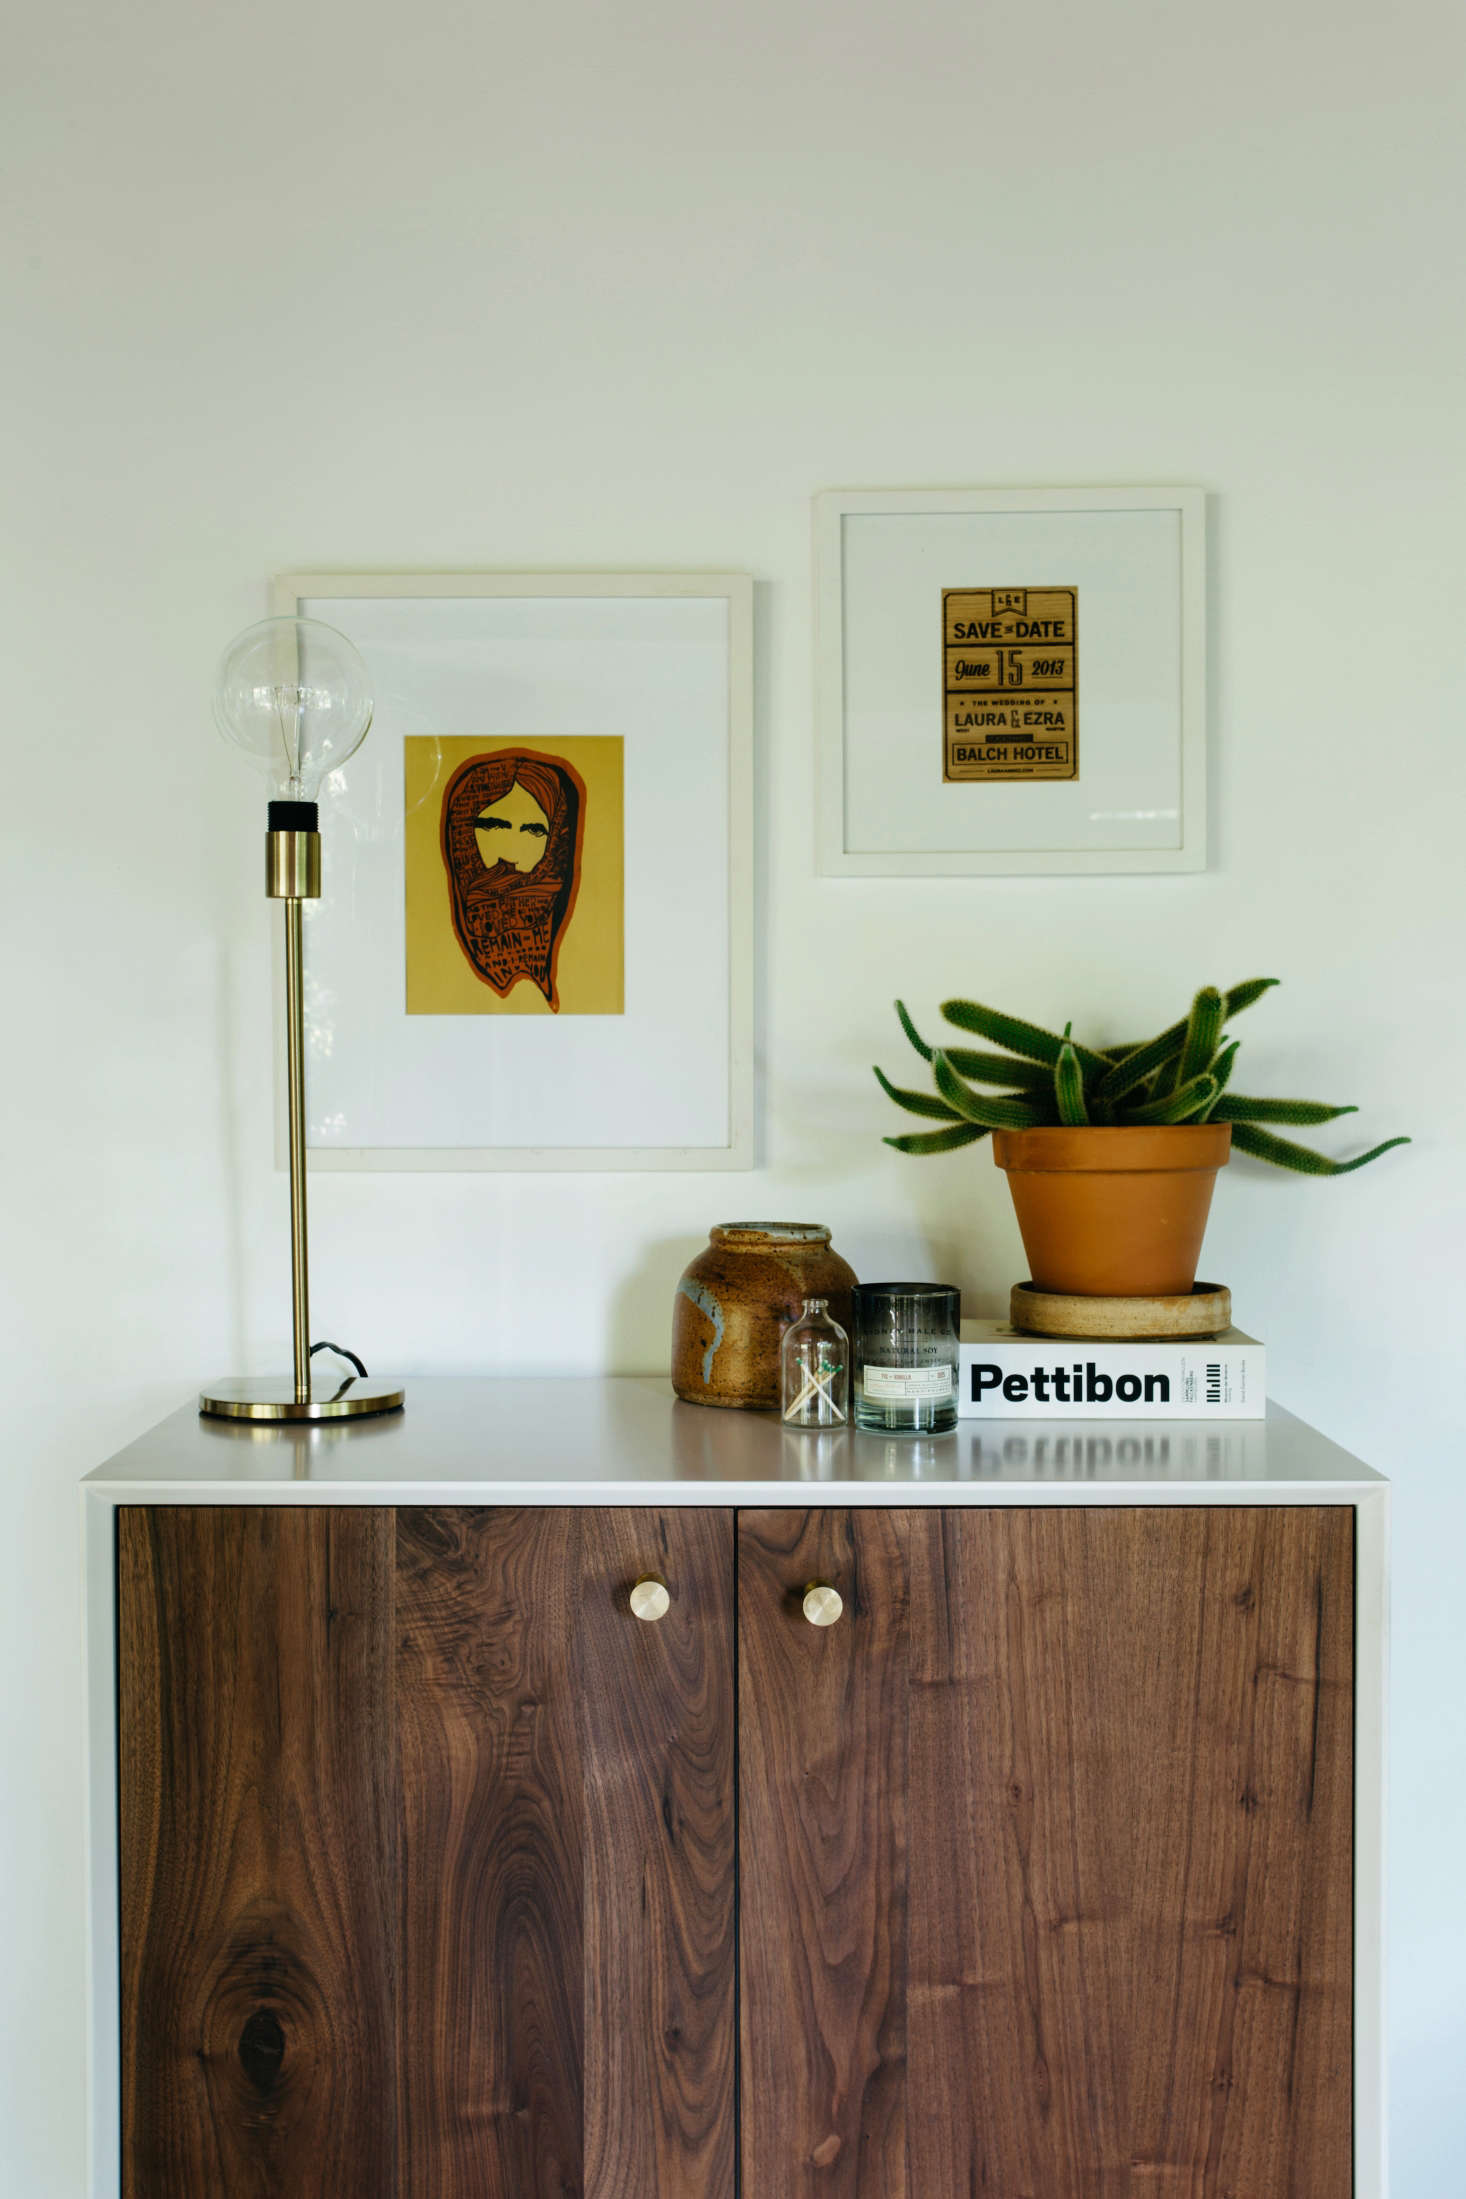 ACincinnati A Cabinet from Organic Modernism holds records.